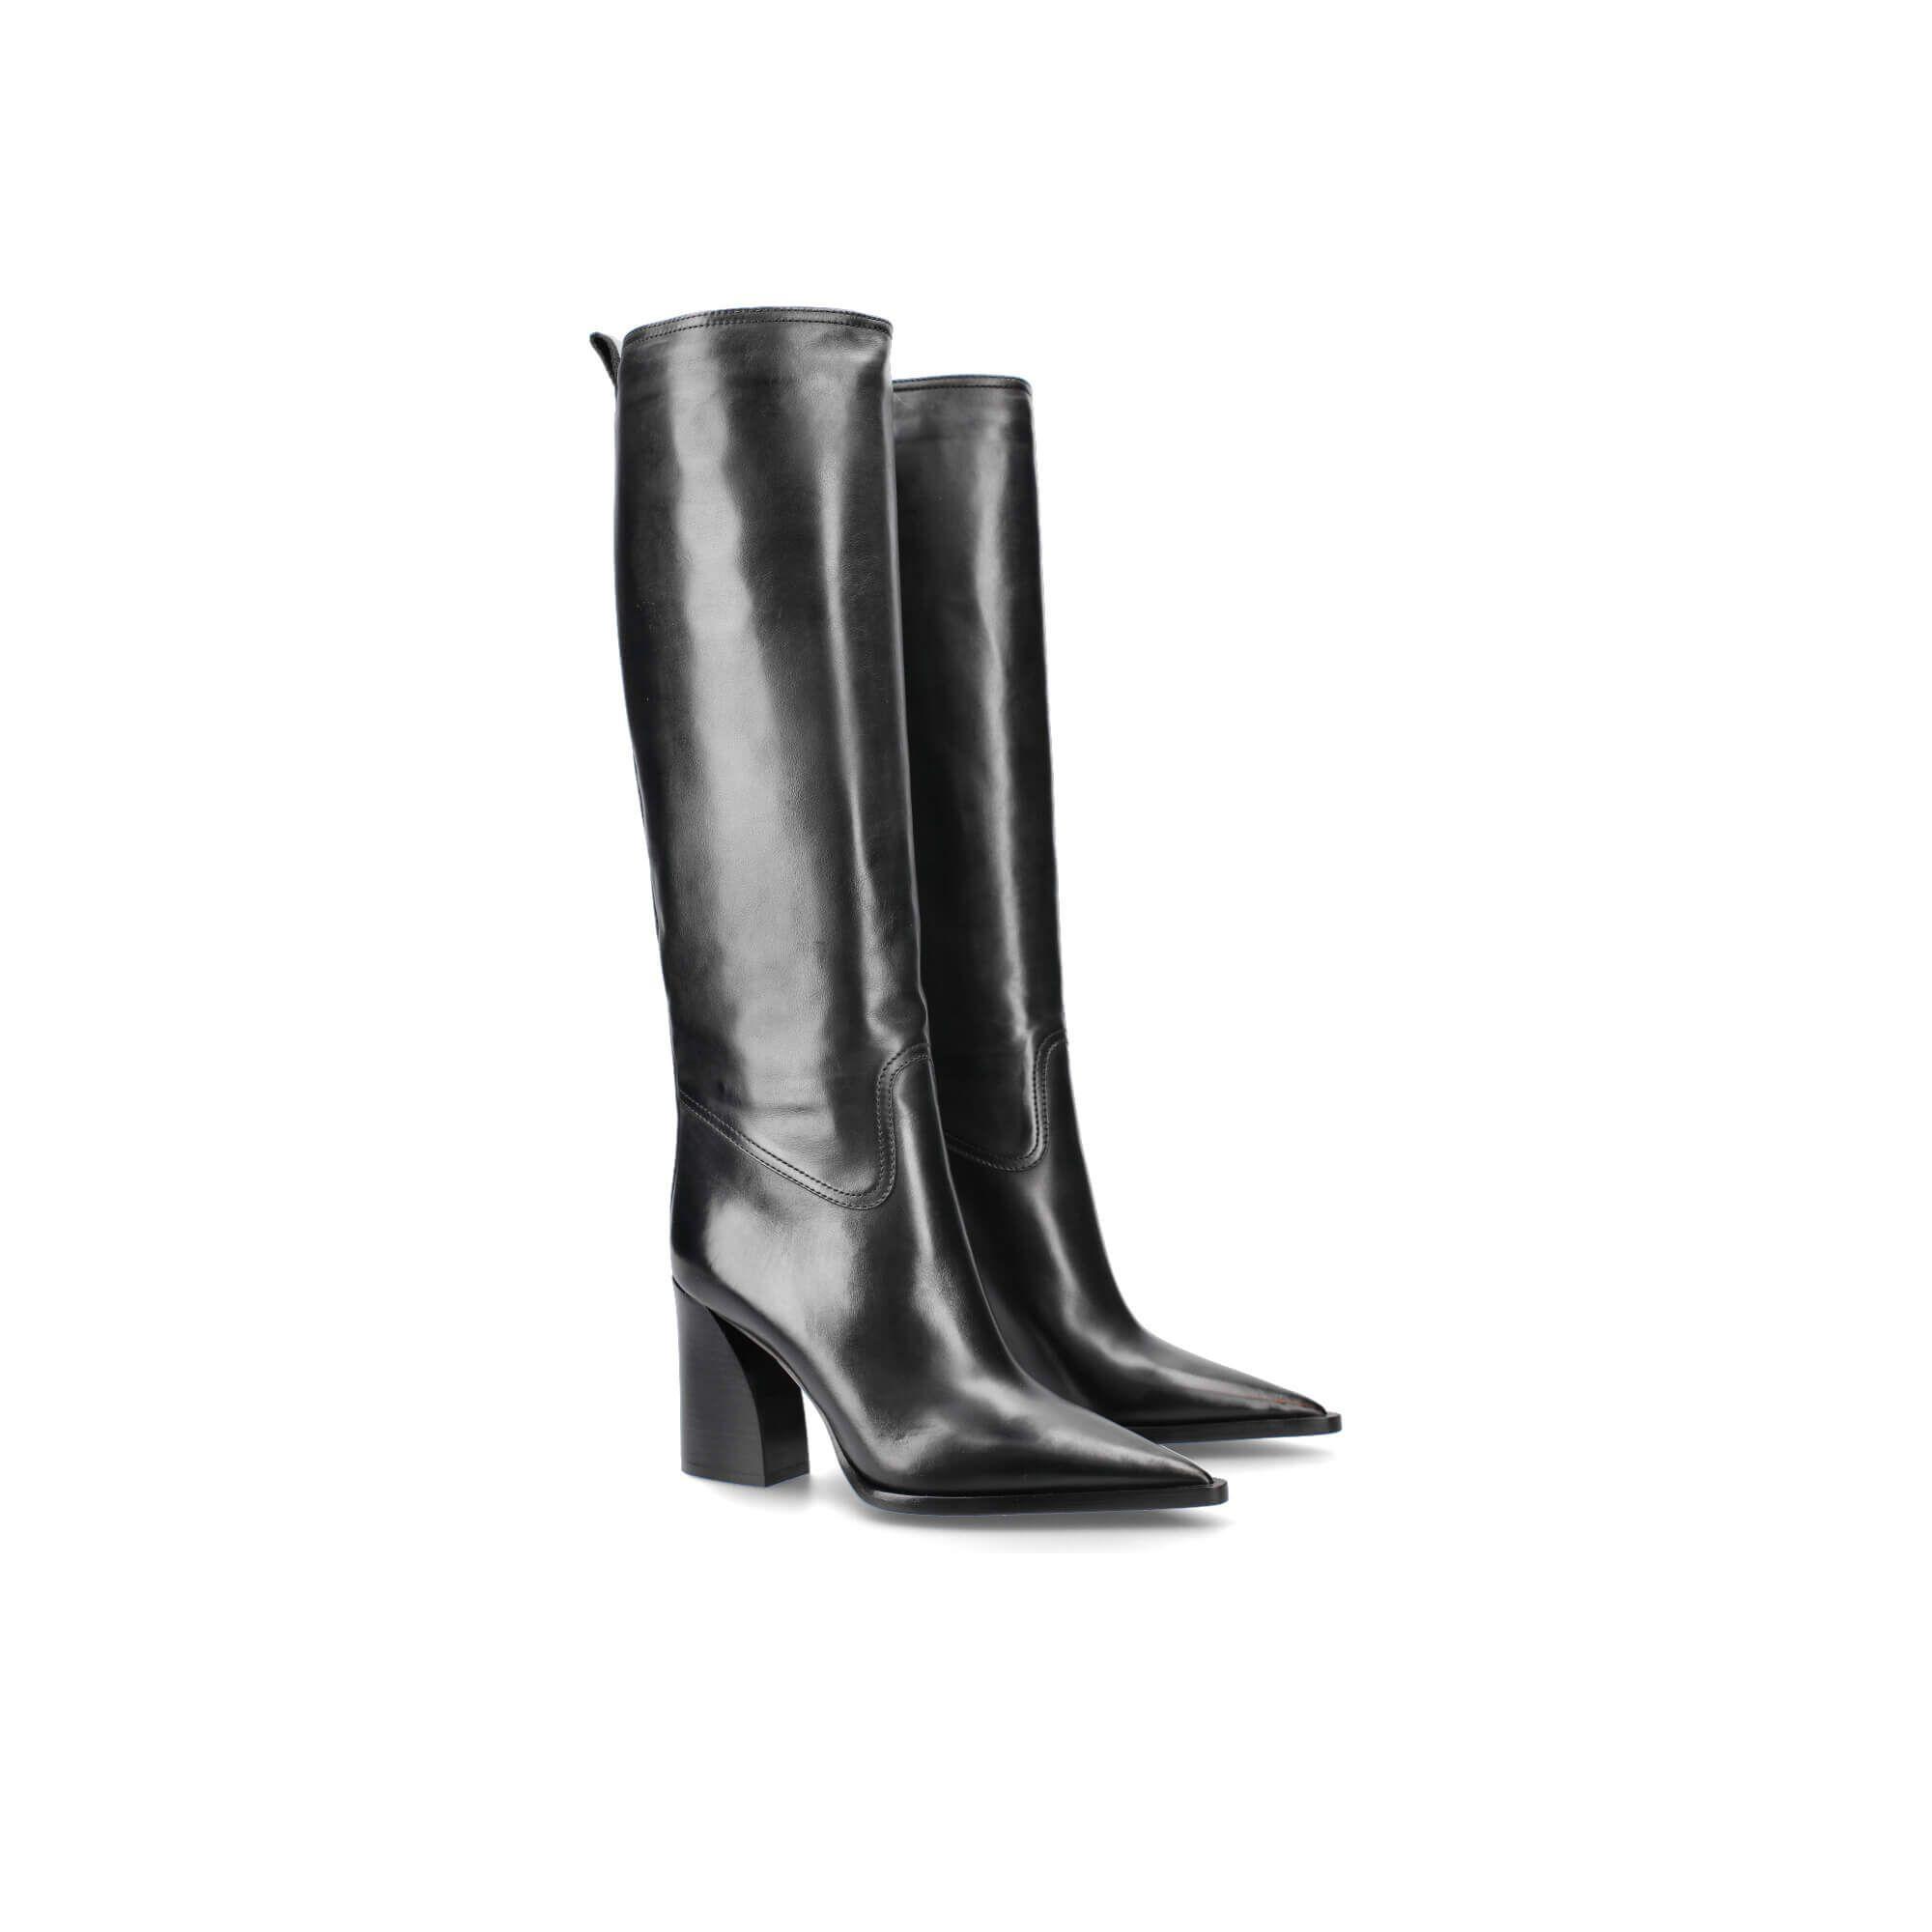 Boot 5962 - 8